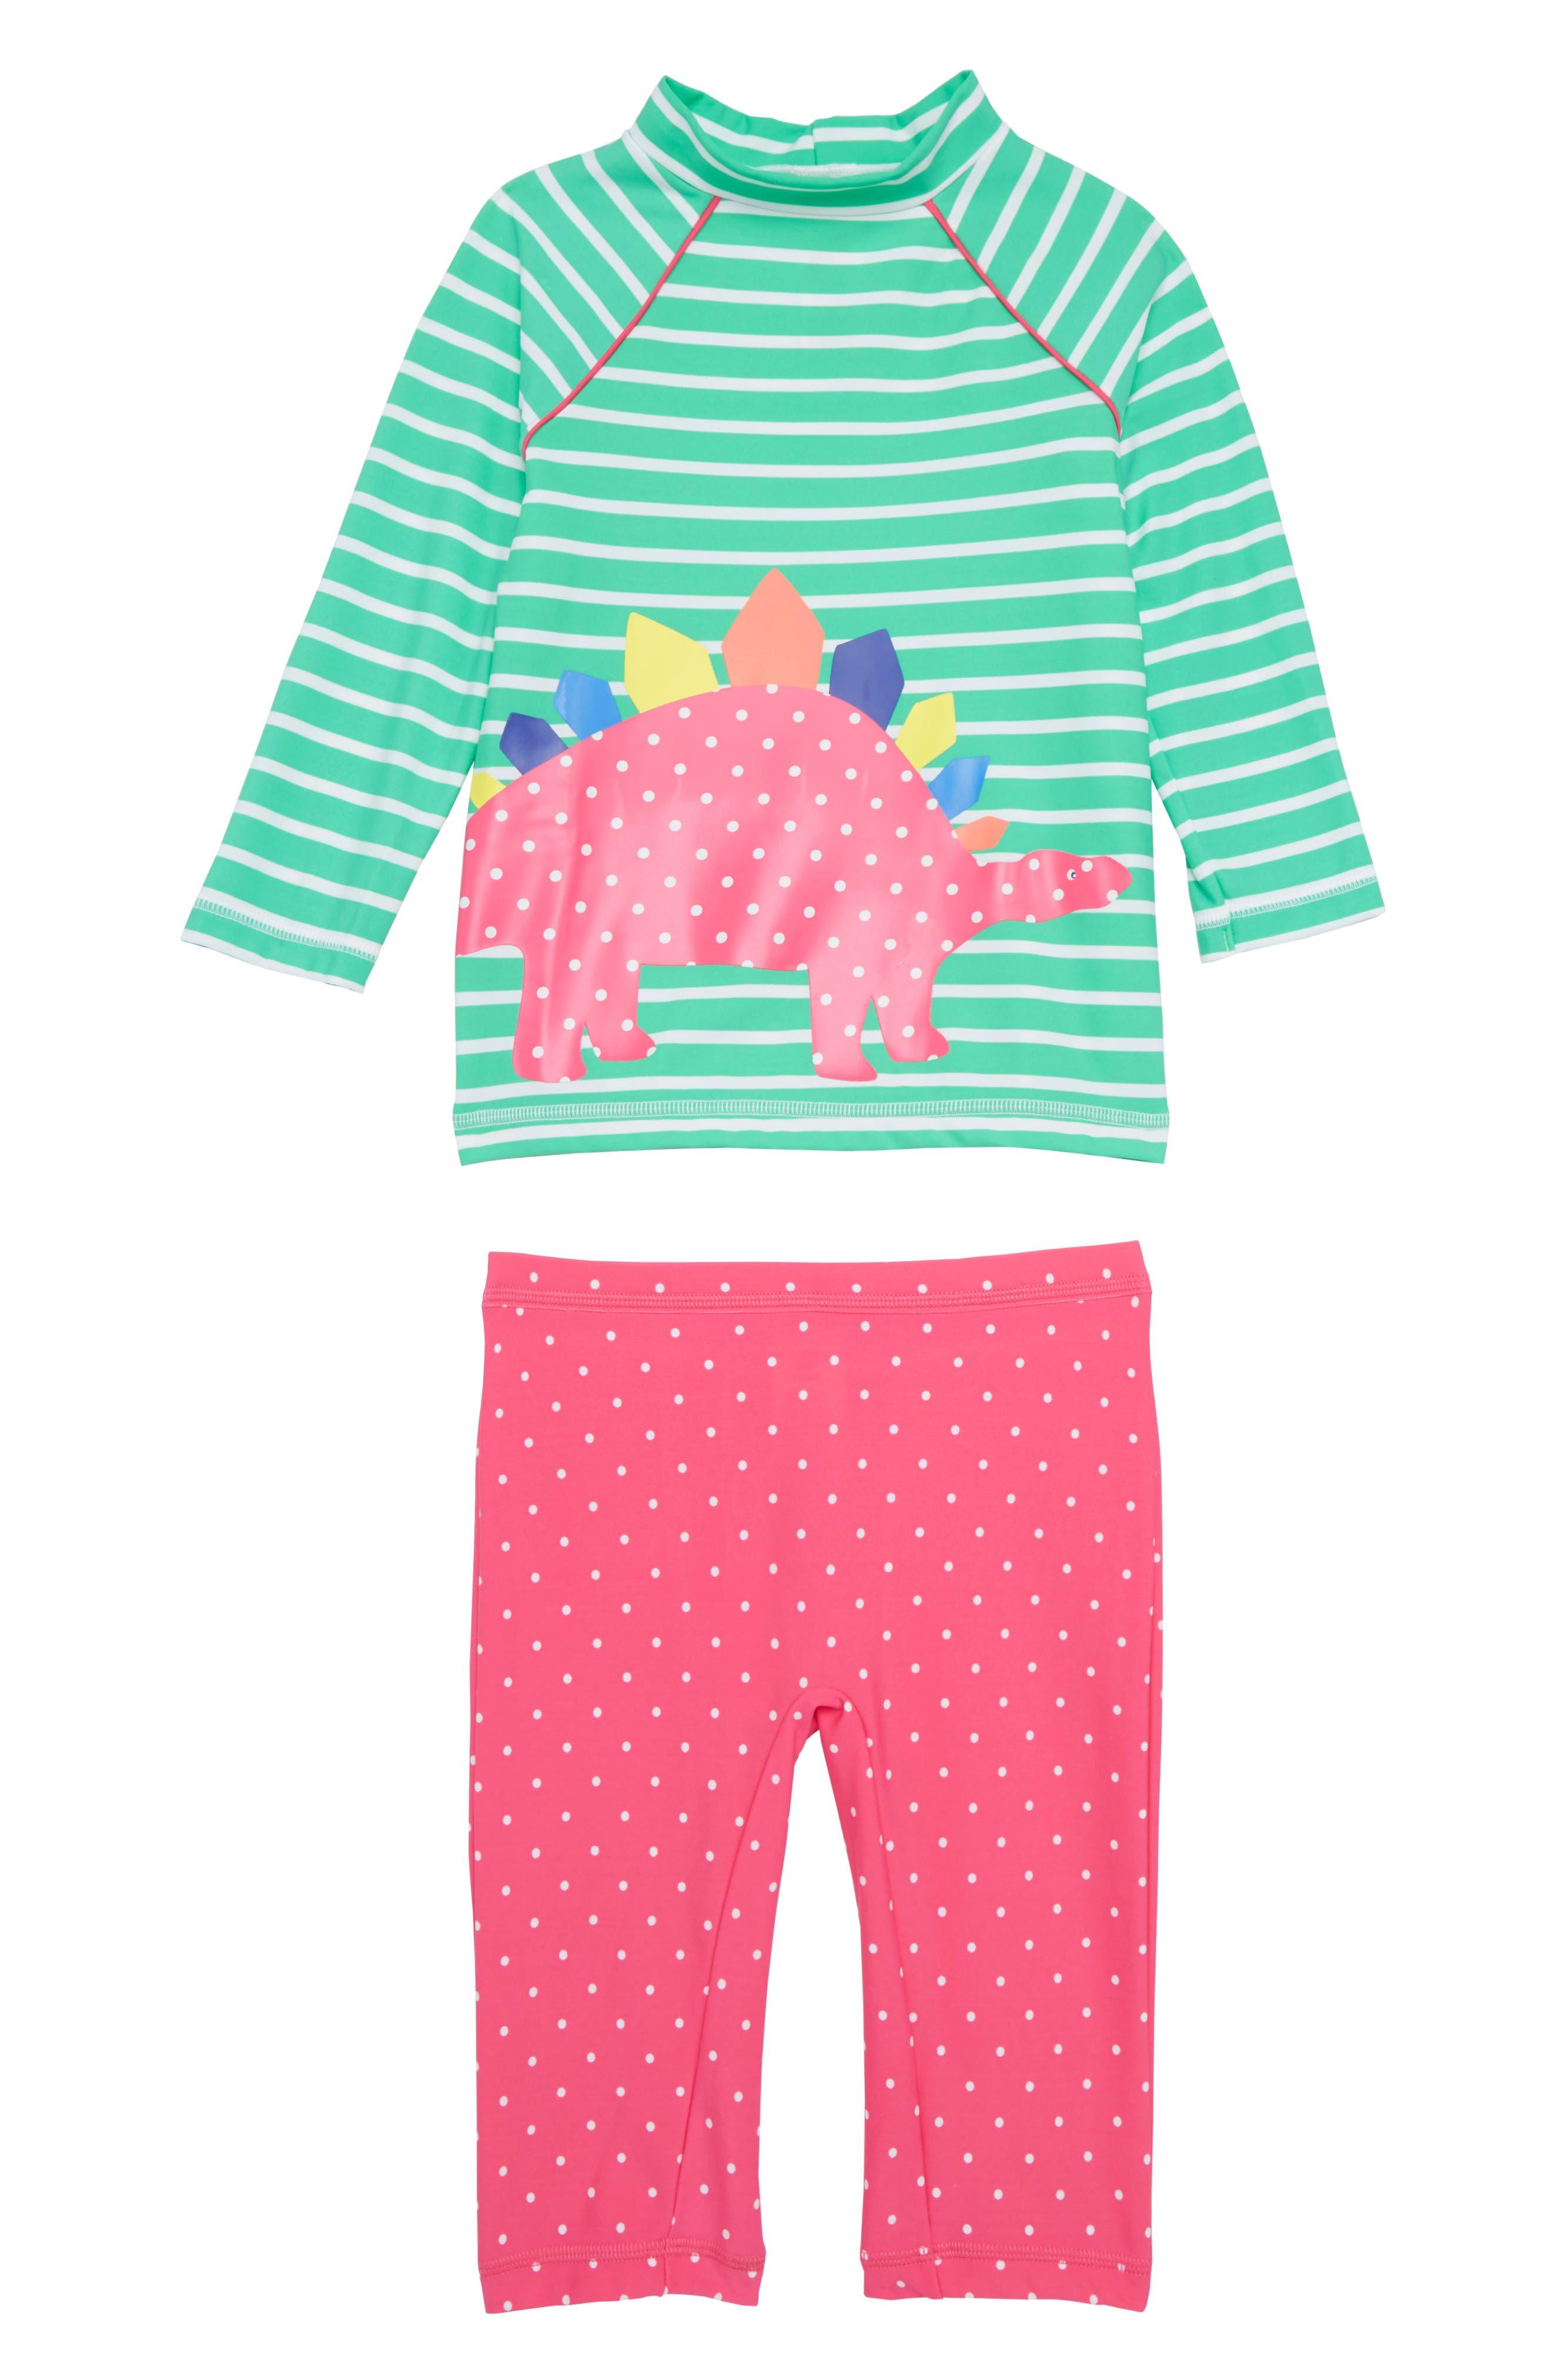 Mini Boden Sea Explorer Surf Suit Two-Piece Rashguard Swimsuit (Toddler Girls, Little Girls & Big Girls)